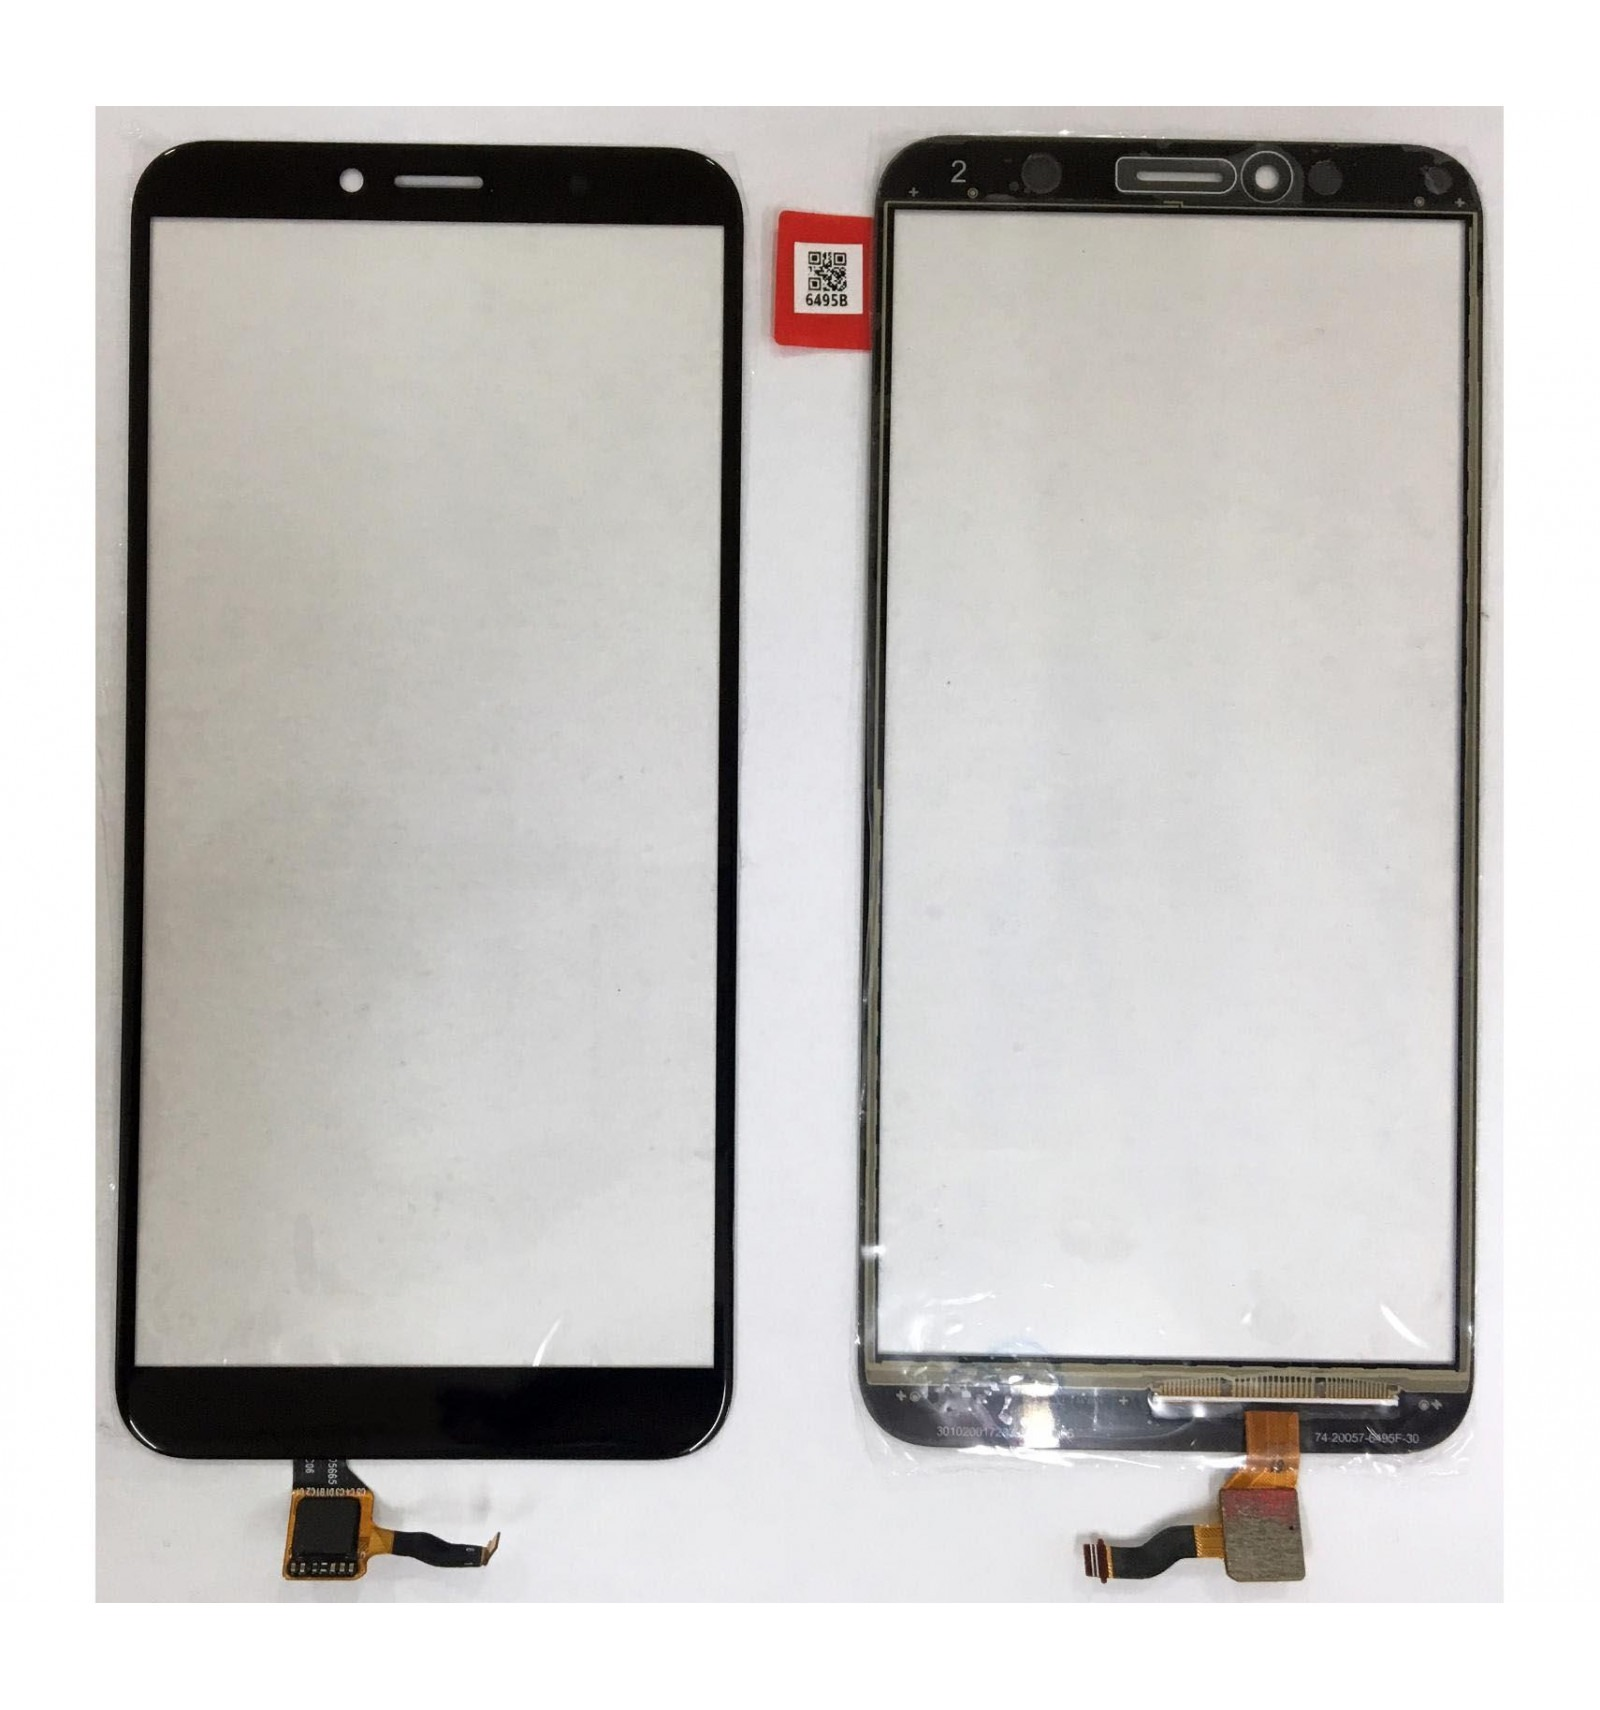 Promo Huawei Y6 Update 2018 Jas Semi Formal Pria Stretch Grey Blz 723 Honor 7a Original Black Touch Screen Y7 Prime Nova 2 Lite Tactil Negro